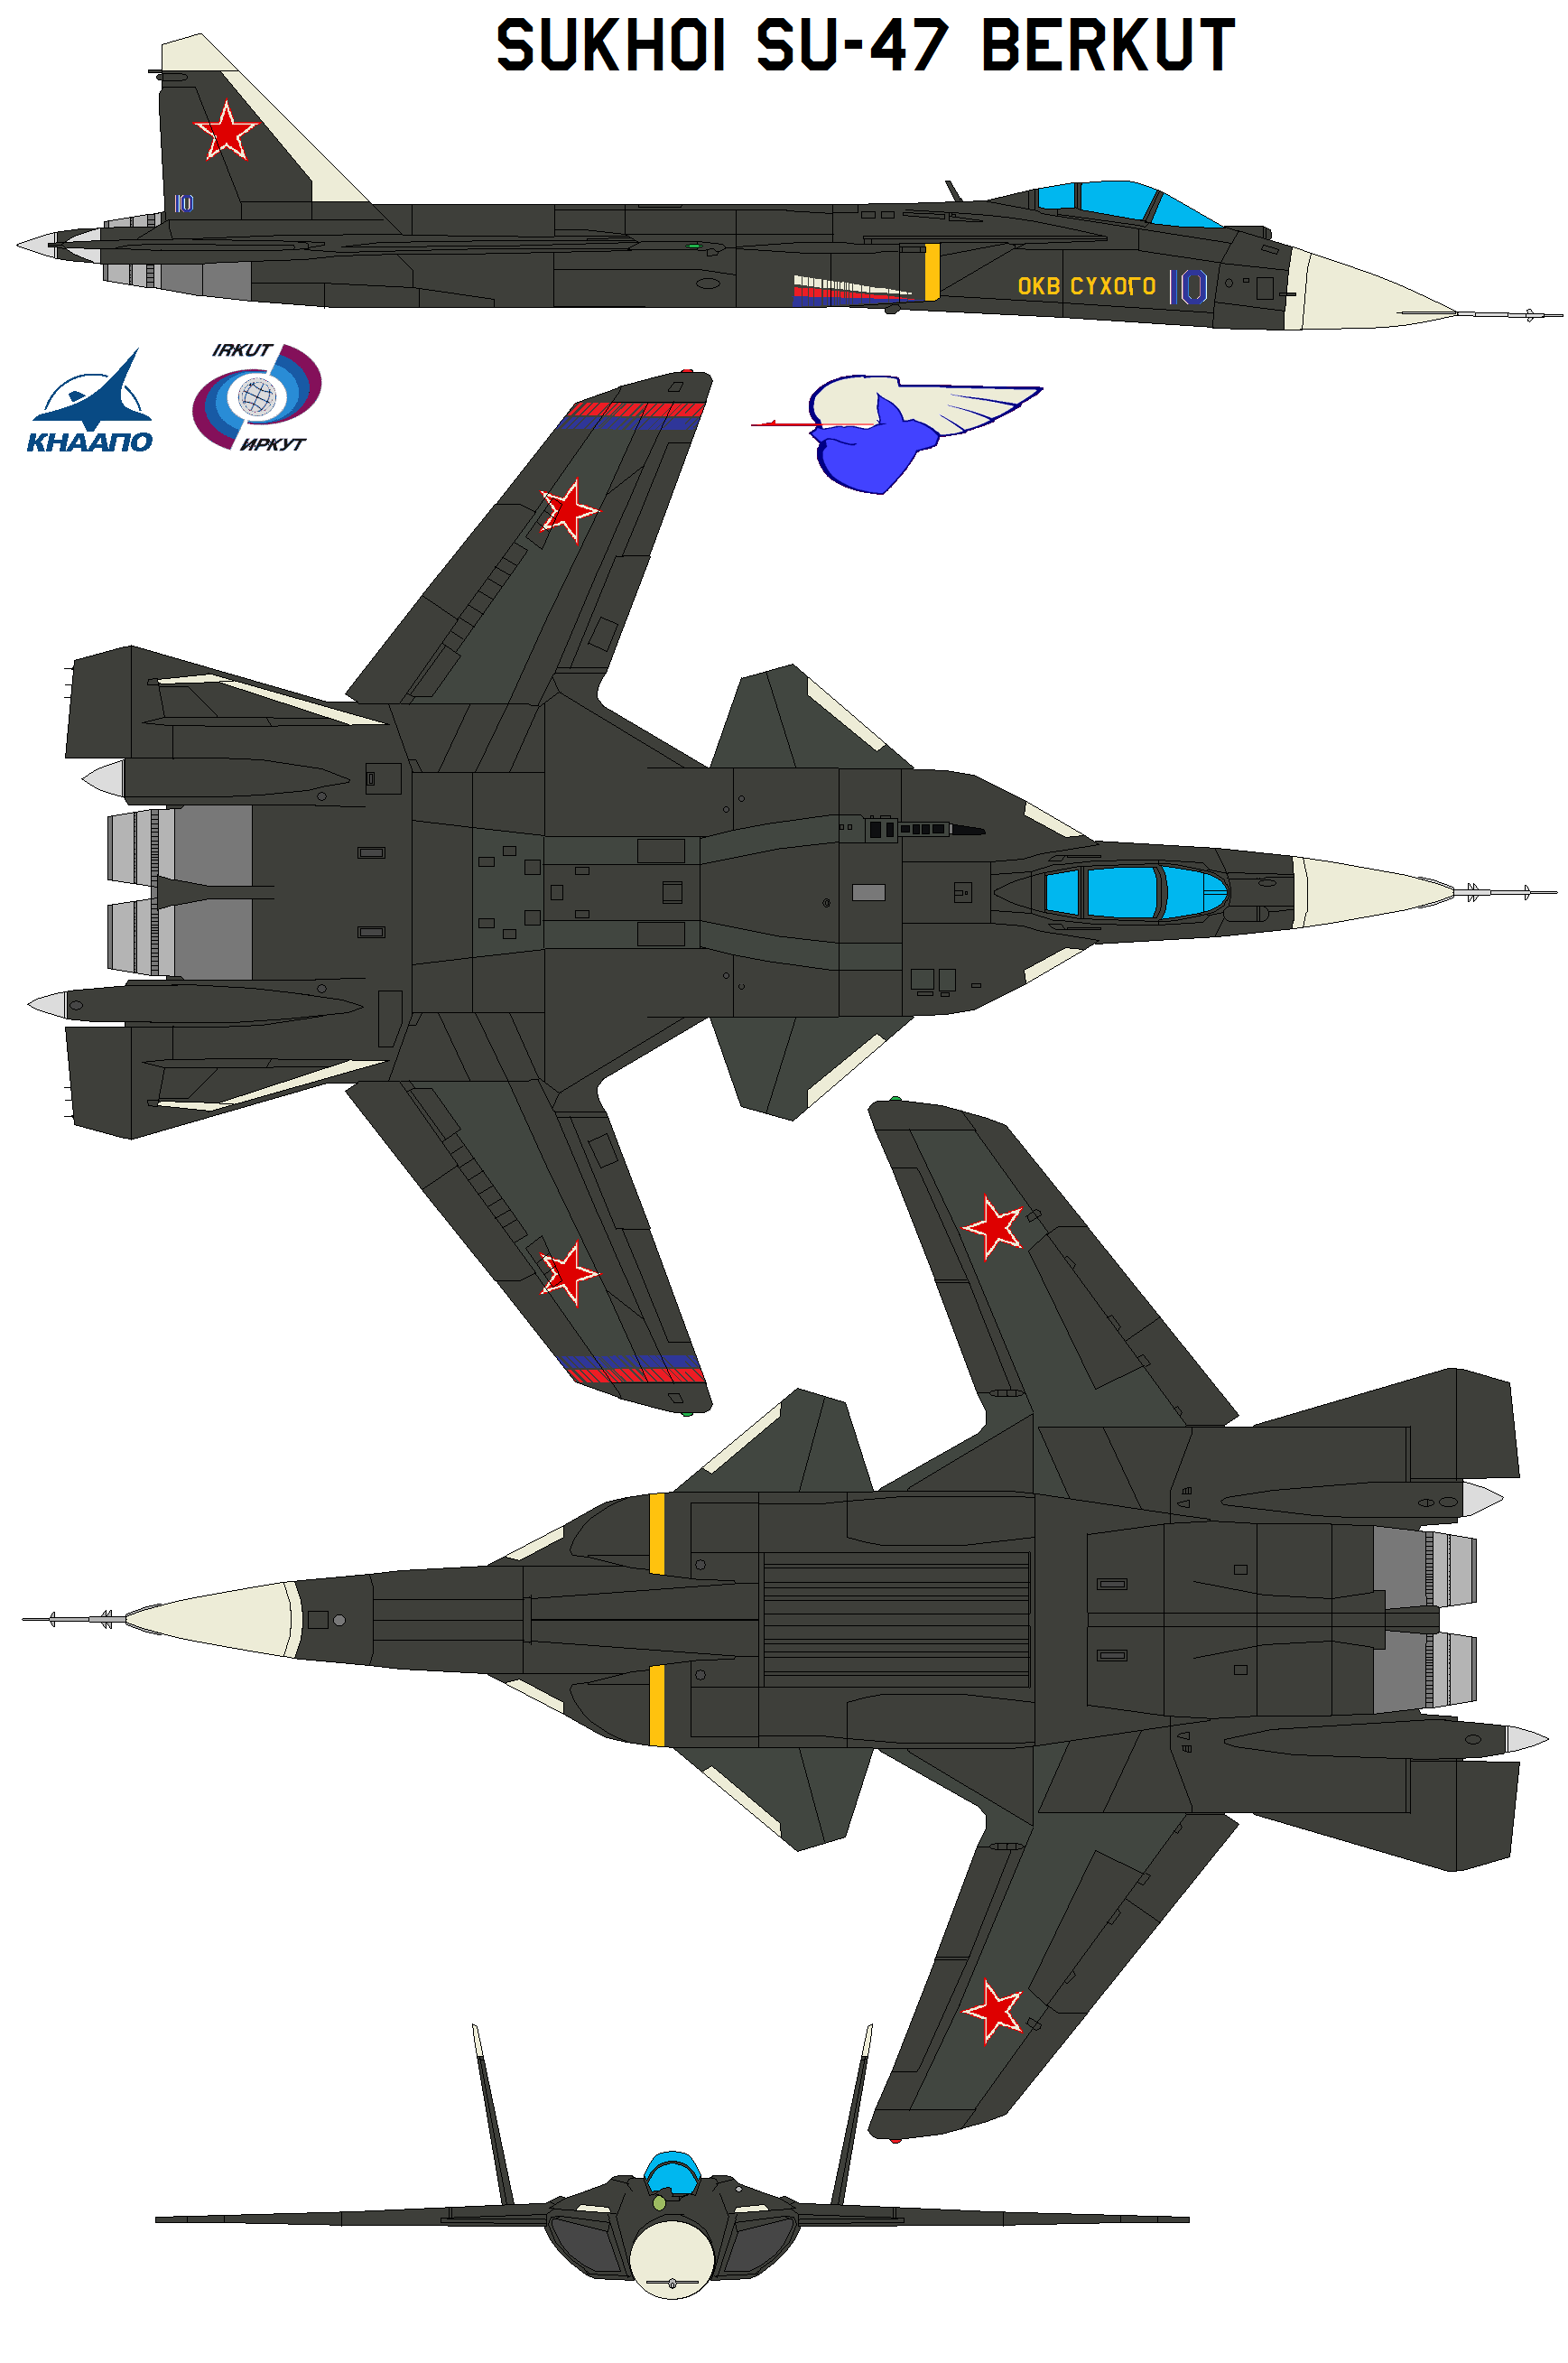 سوخوي سو-47 Su-47 Berkut Golden Eagle Sukhoi_Su_47_Berkut_by_bagera3005